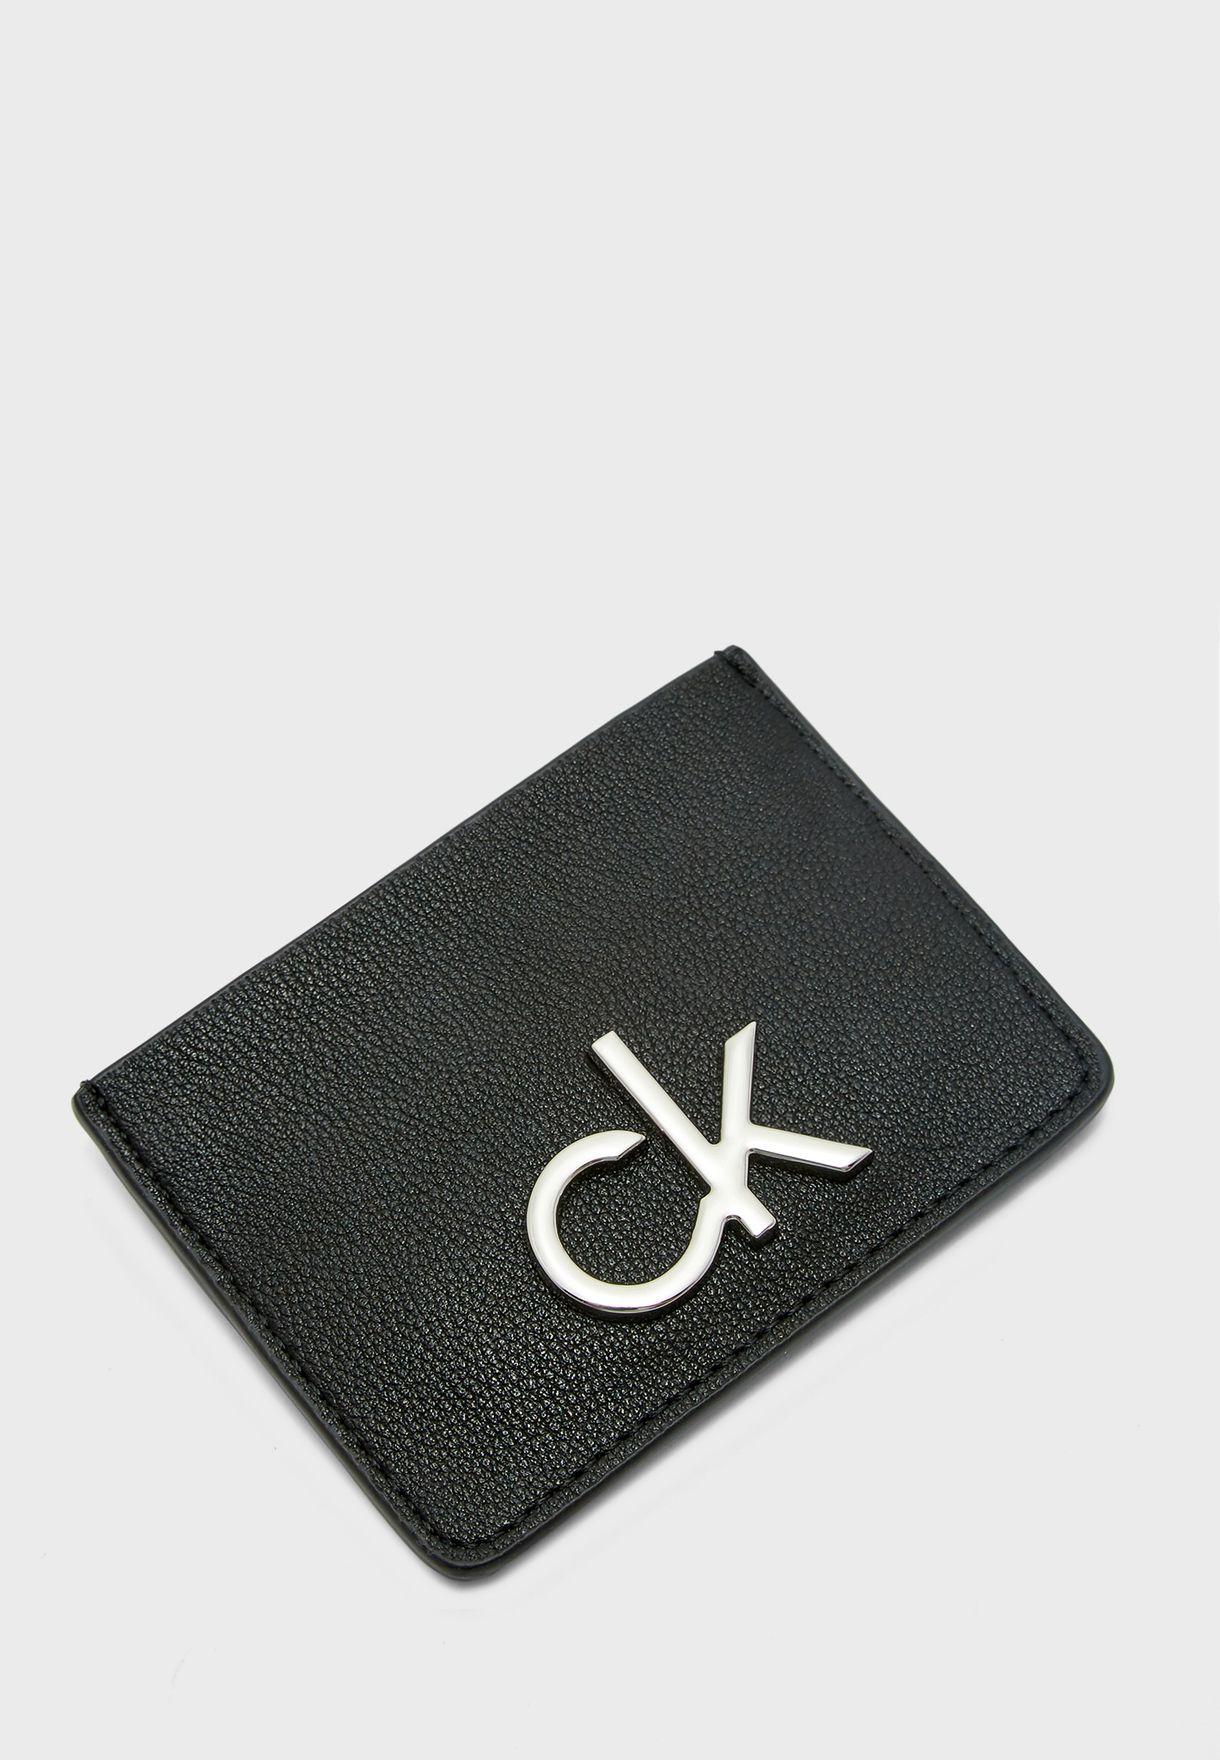 Re-Lock Cardholder